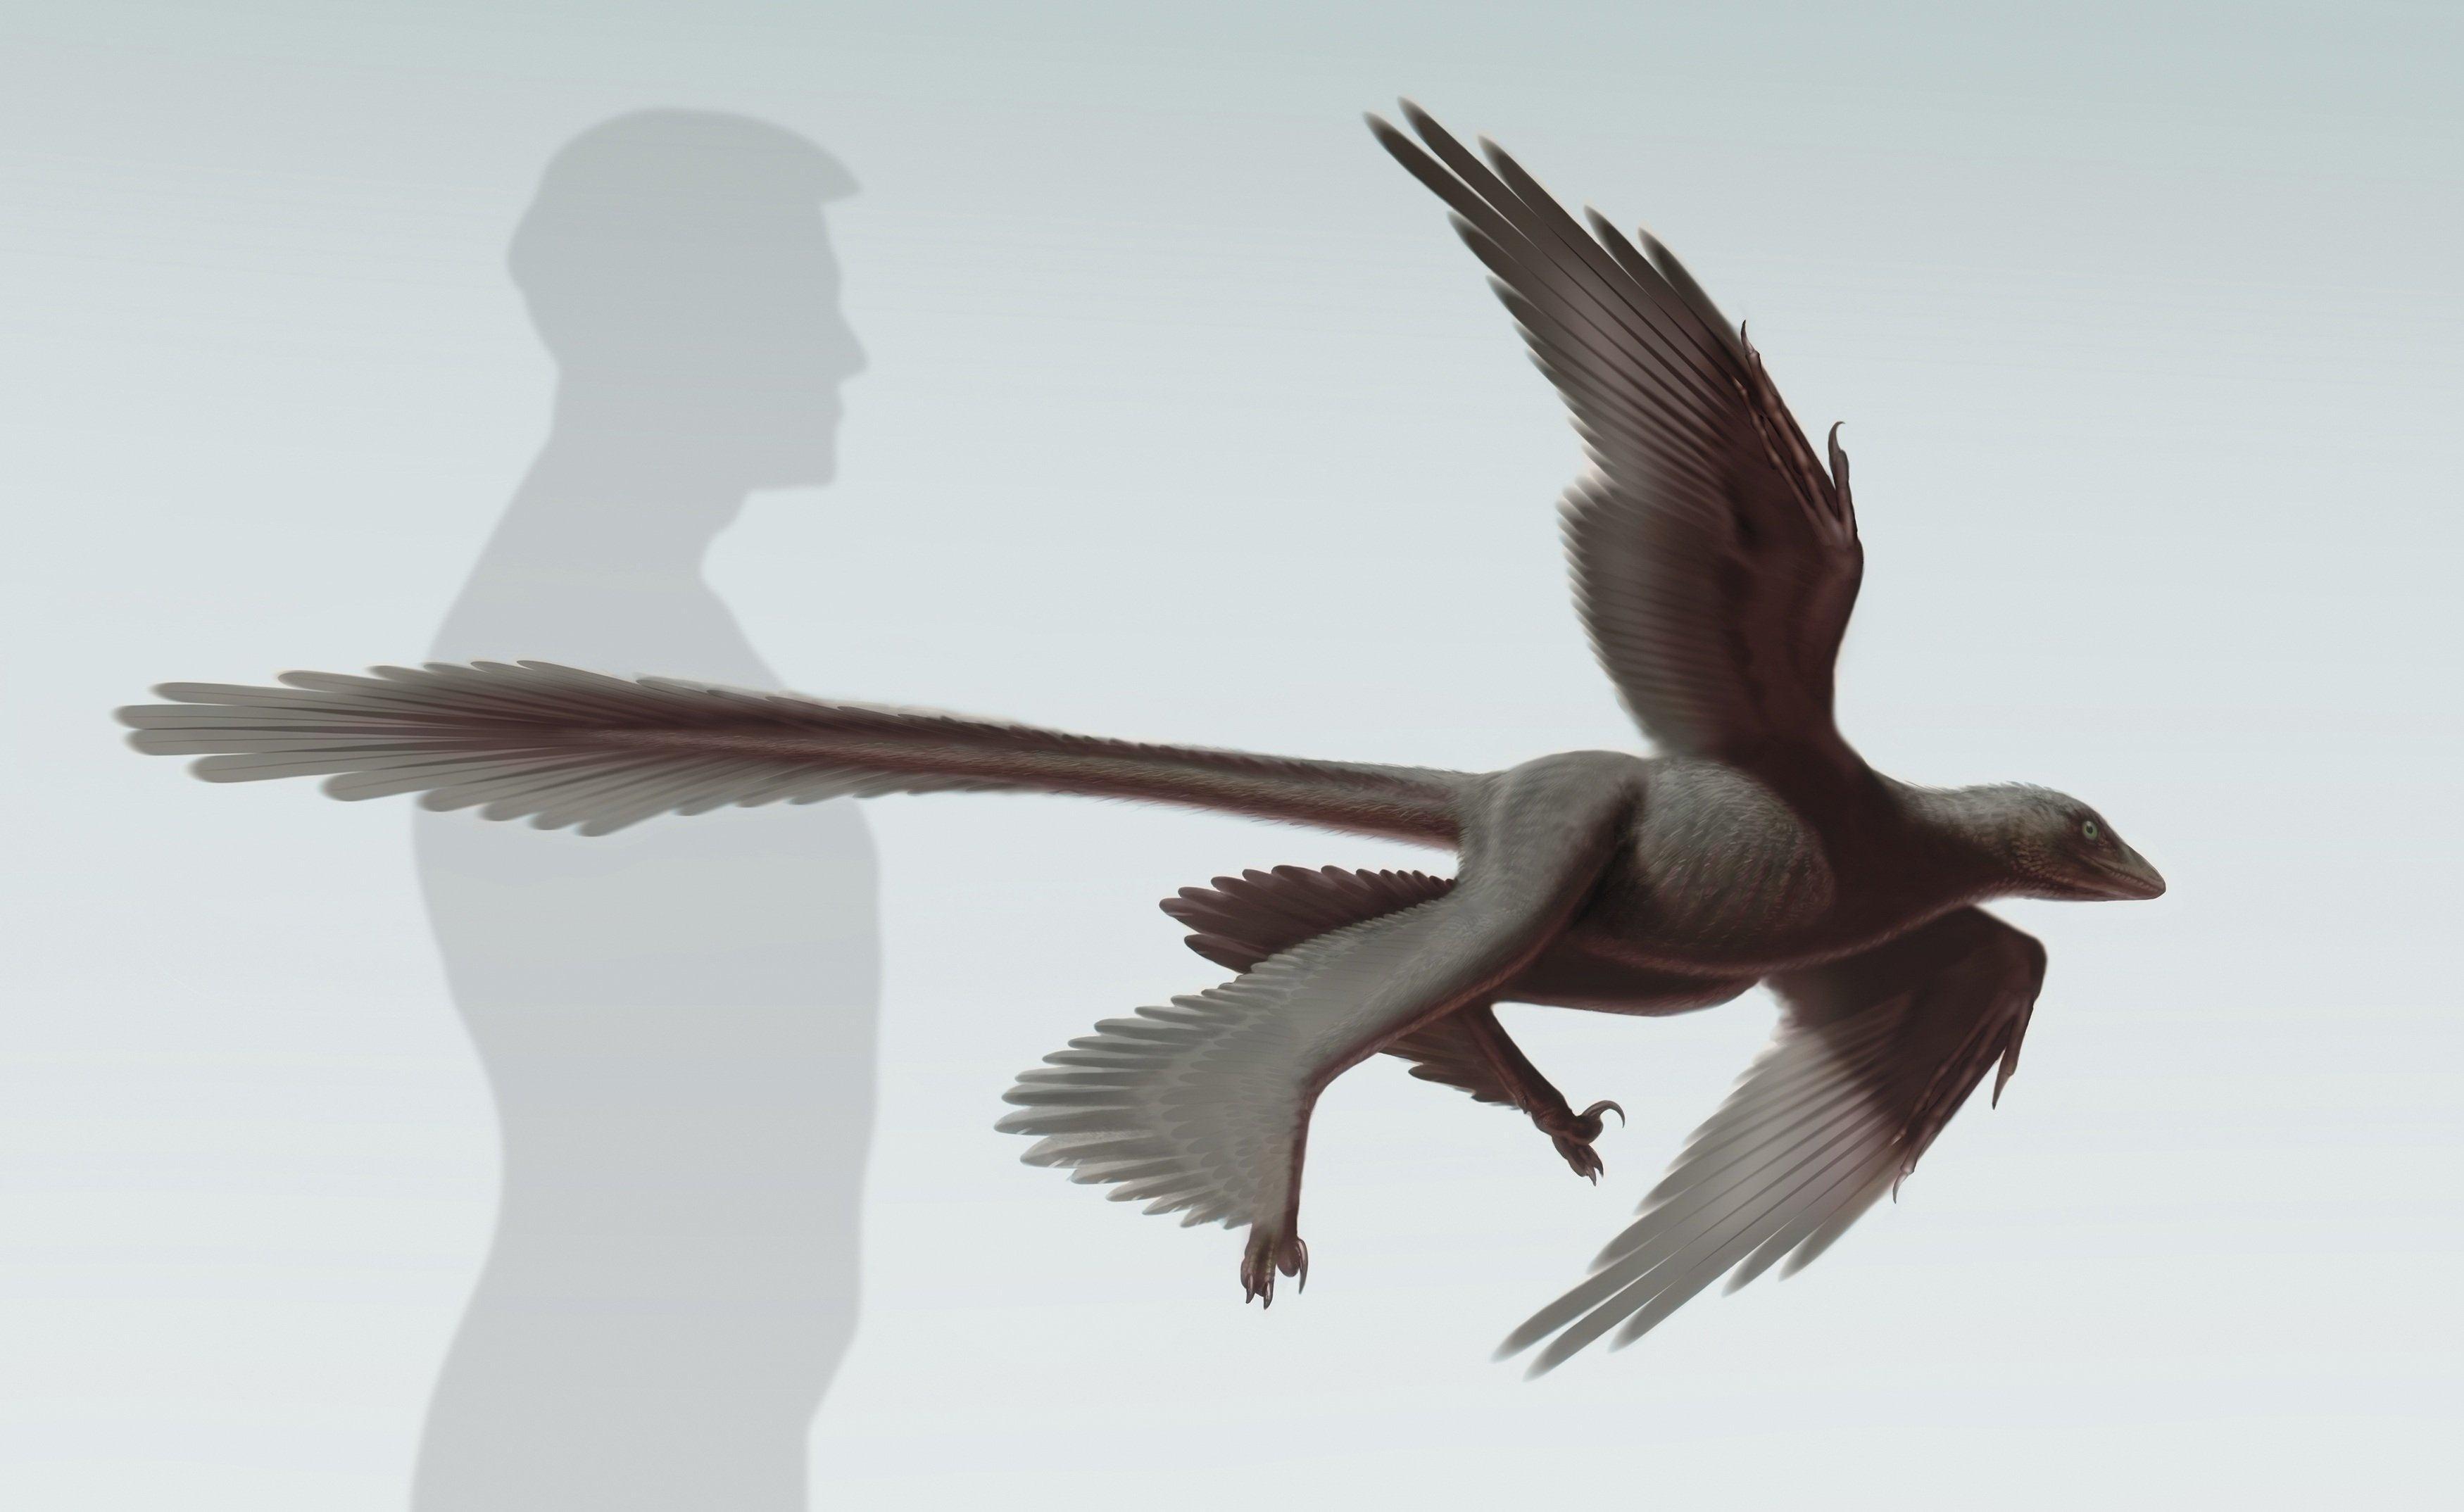 Image: Changyuraptor yangi